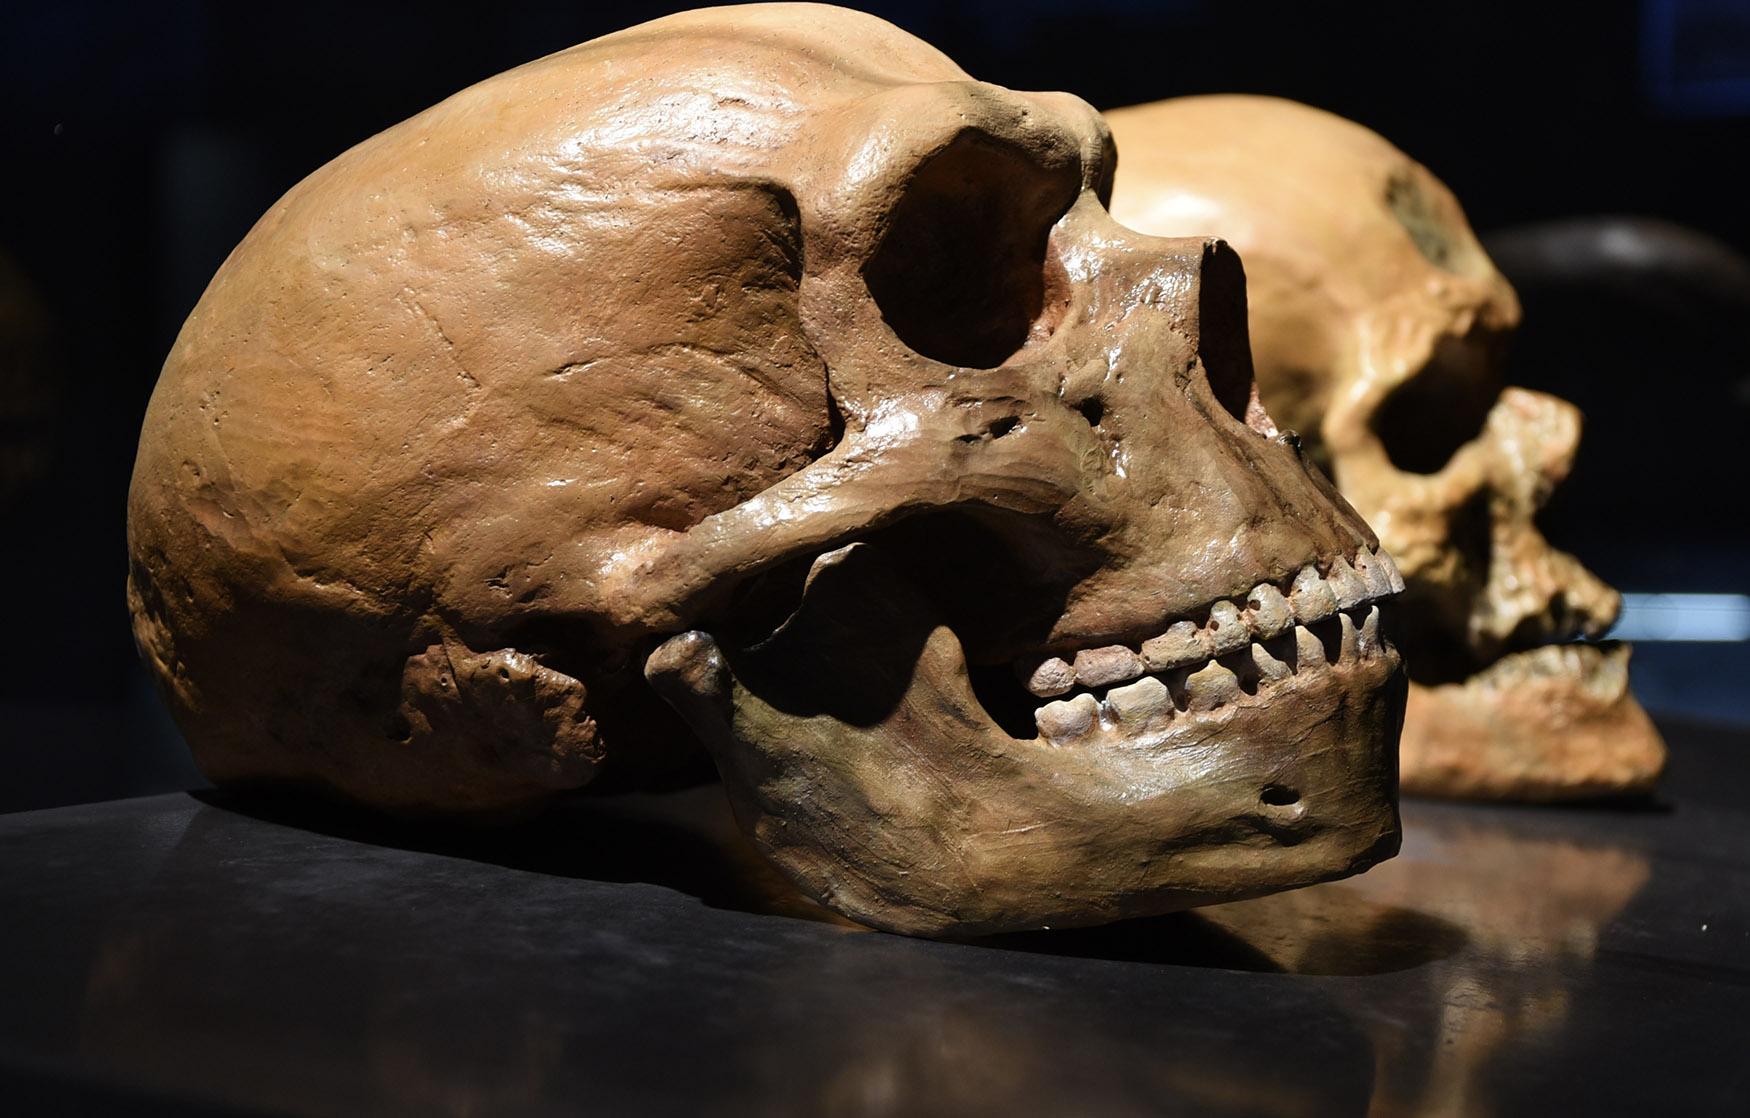 Para ilmuwan menemukan fosil dari spesies baru manusia yang berusia 130.000 tahun